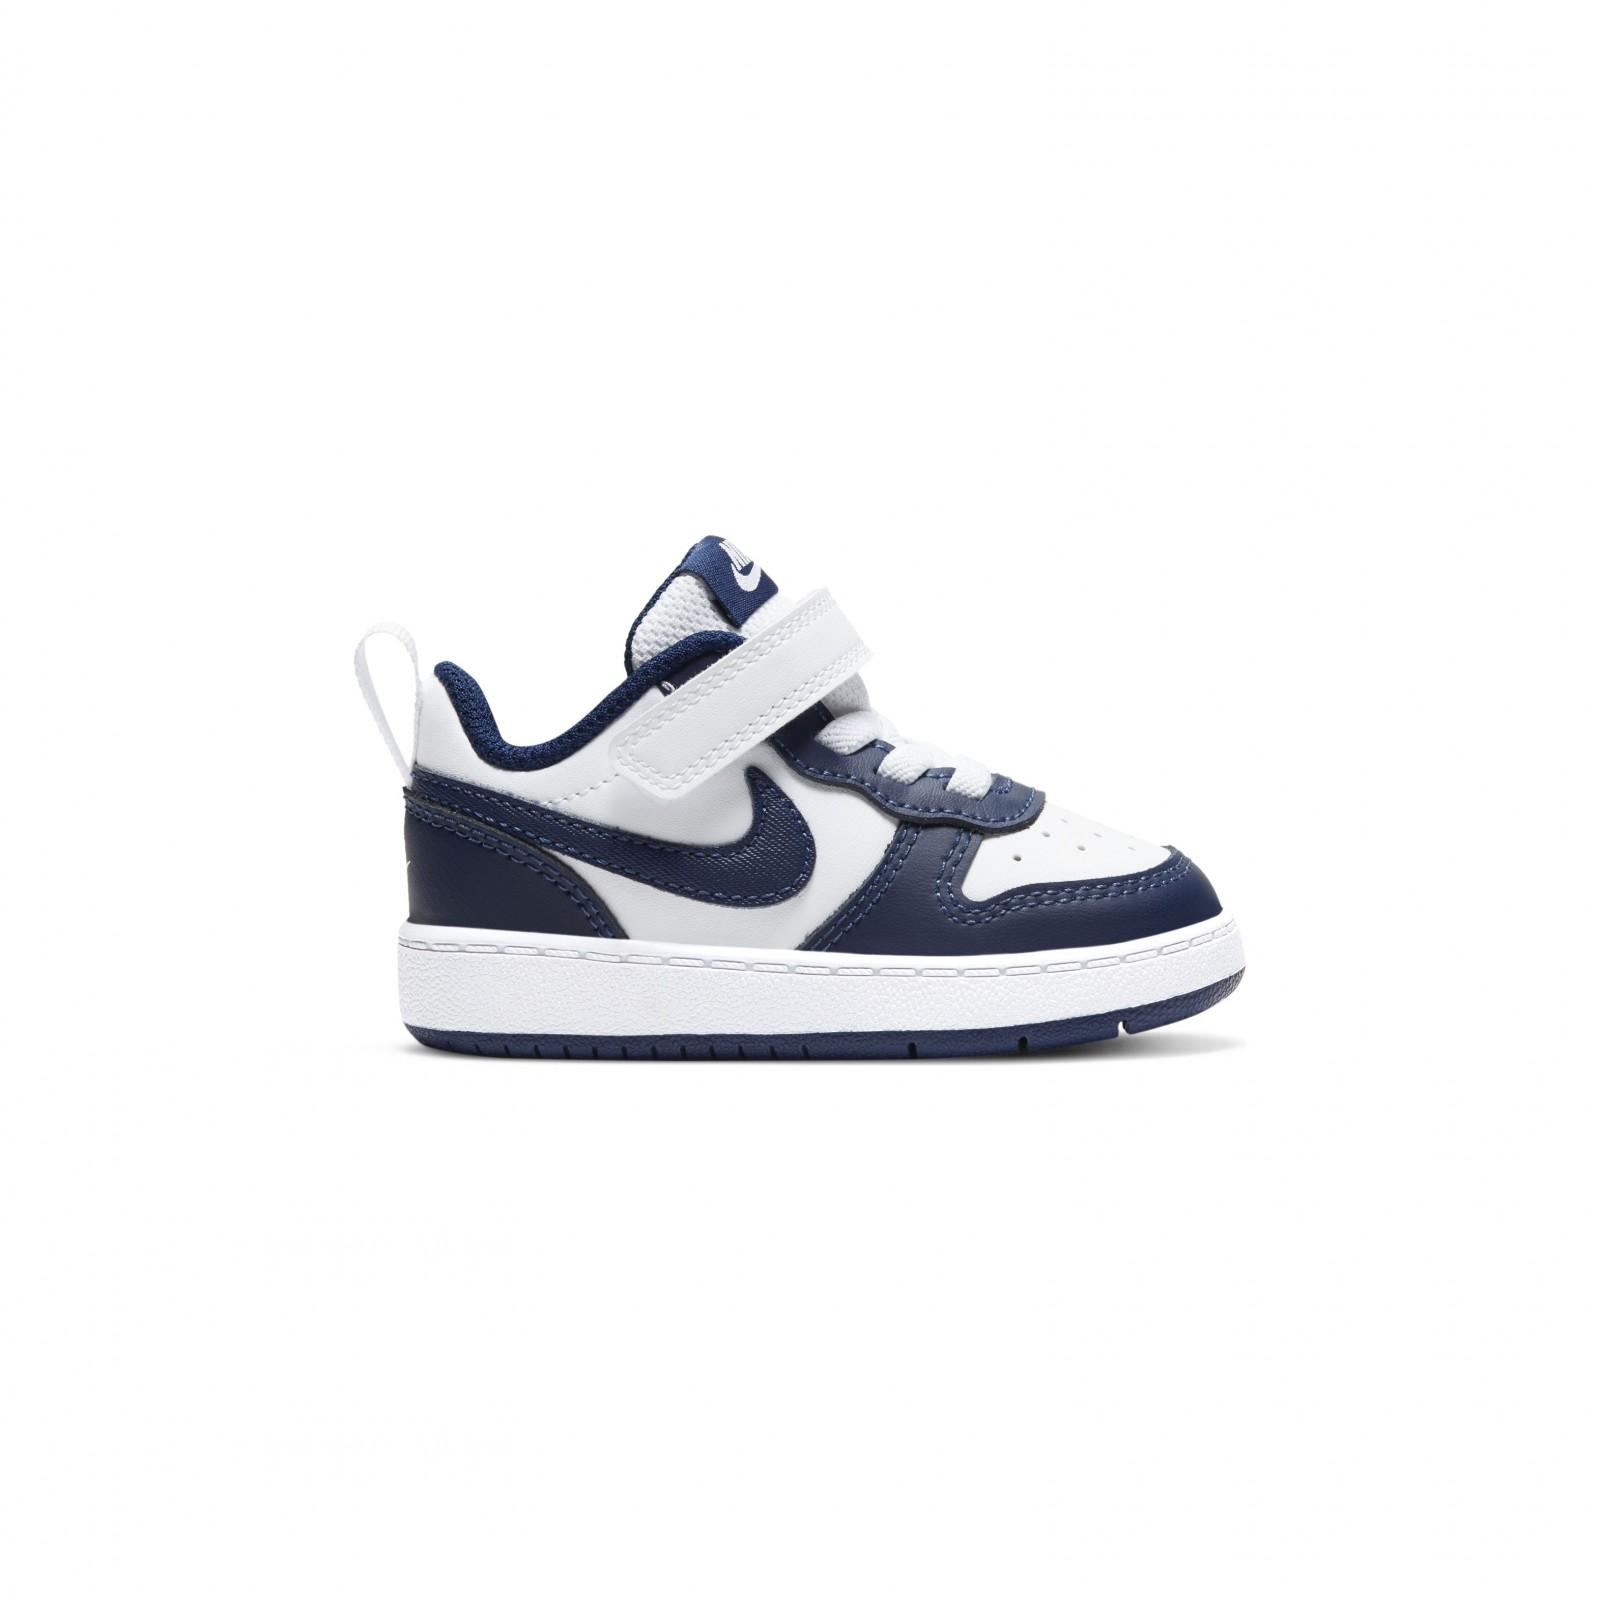 Nike Court Borough Low 2 WHITE/BLUE VOID-SIGNAL BLUE